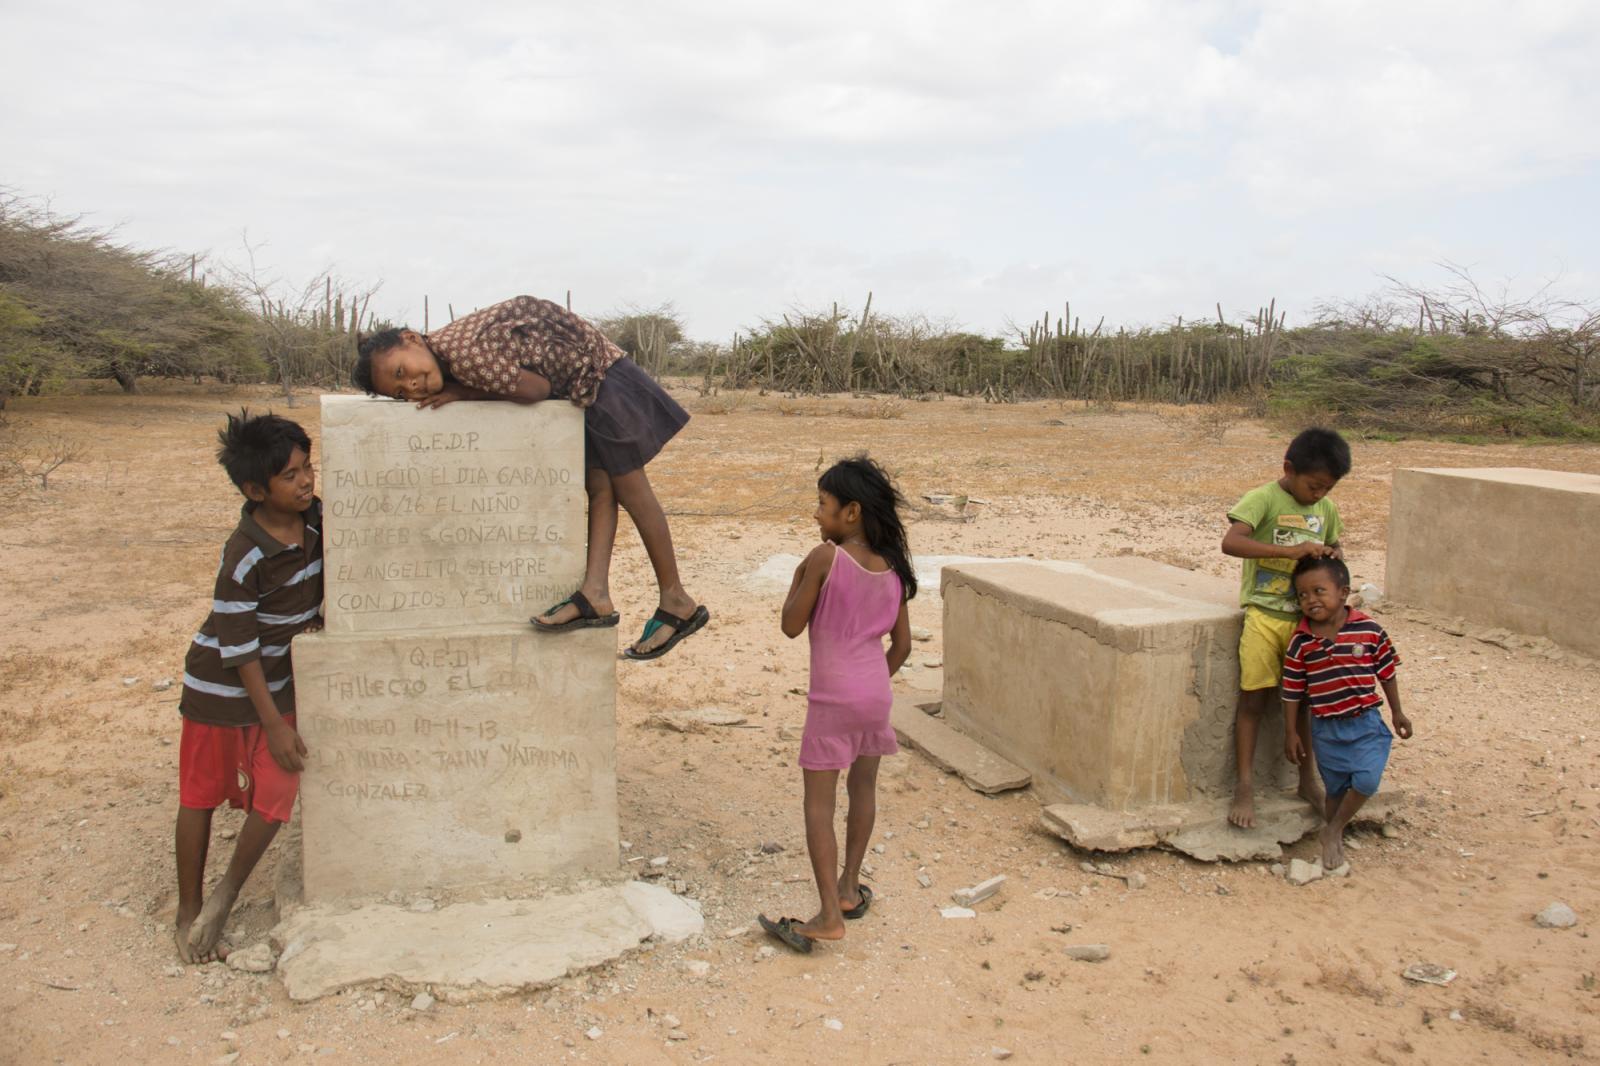 Photography image - Loading Guajira_01.jpg